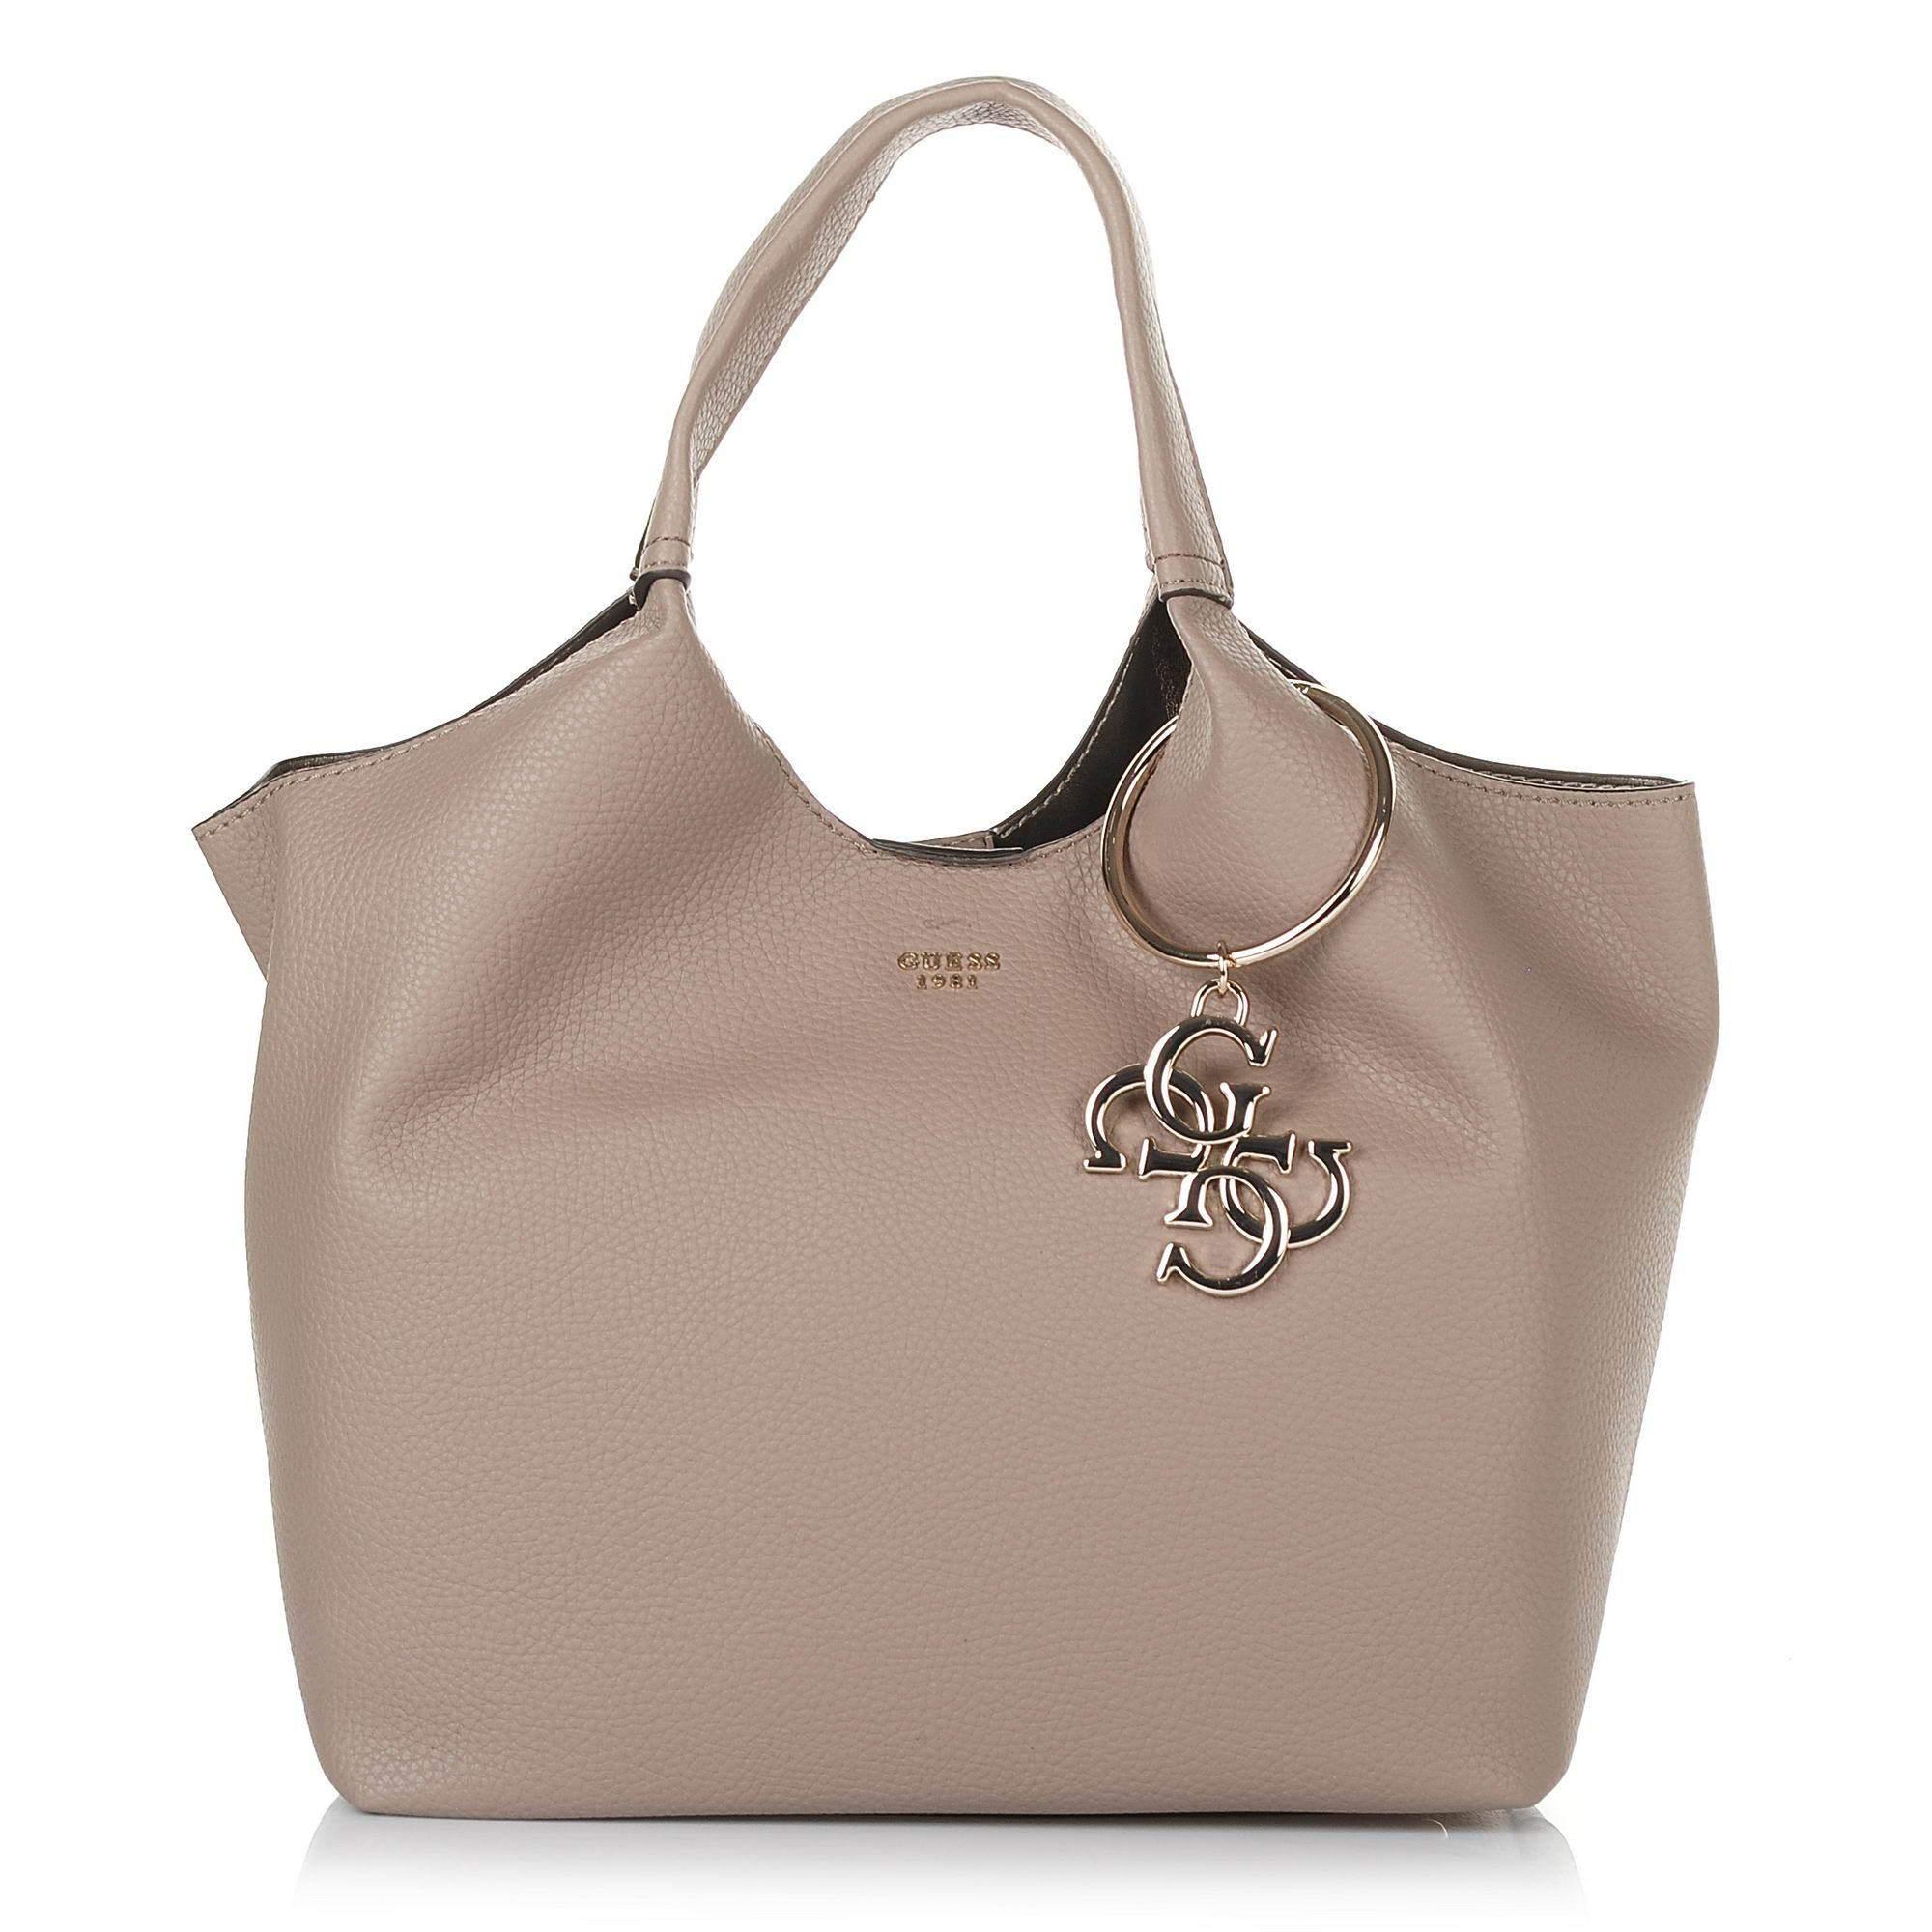 Tote Τσάντα Guess VY686506 γυναικα   γυναικεία τσάντα